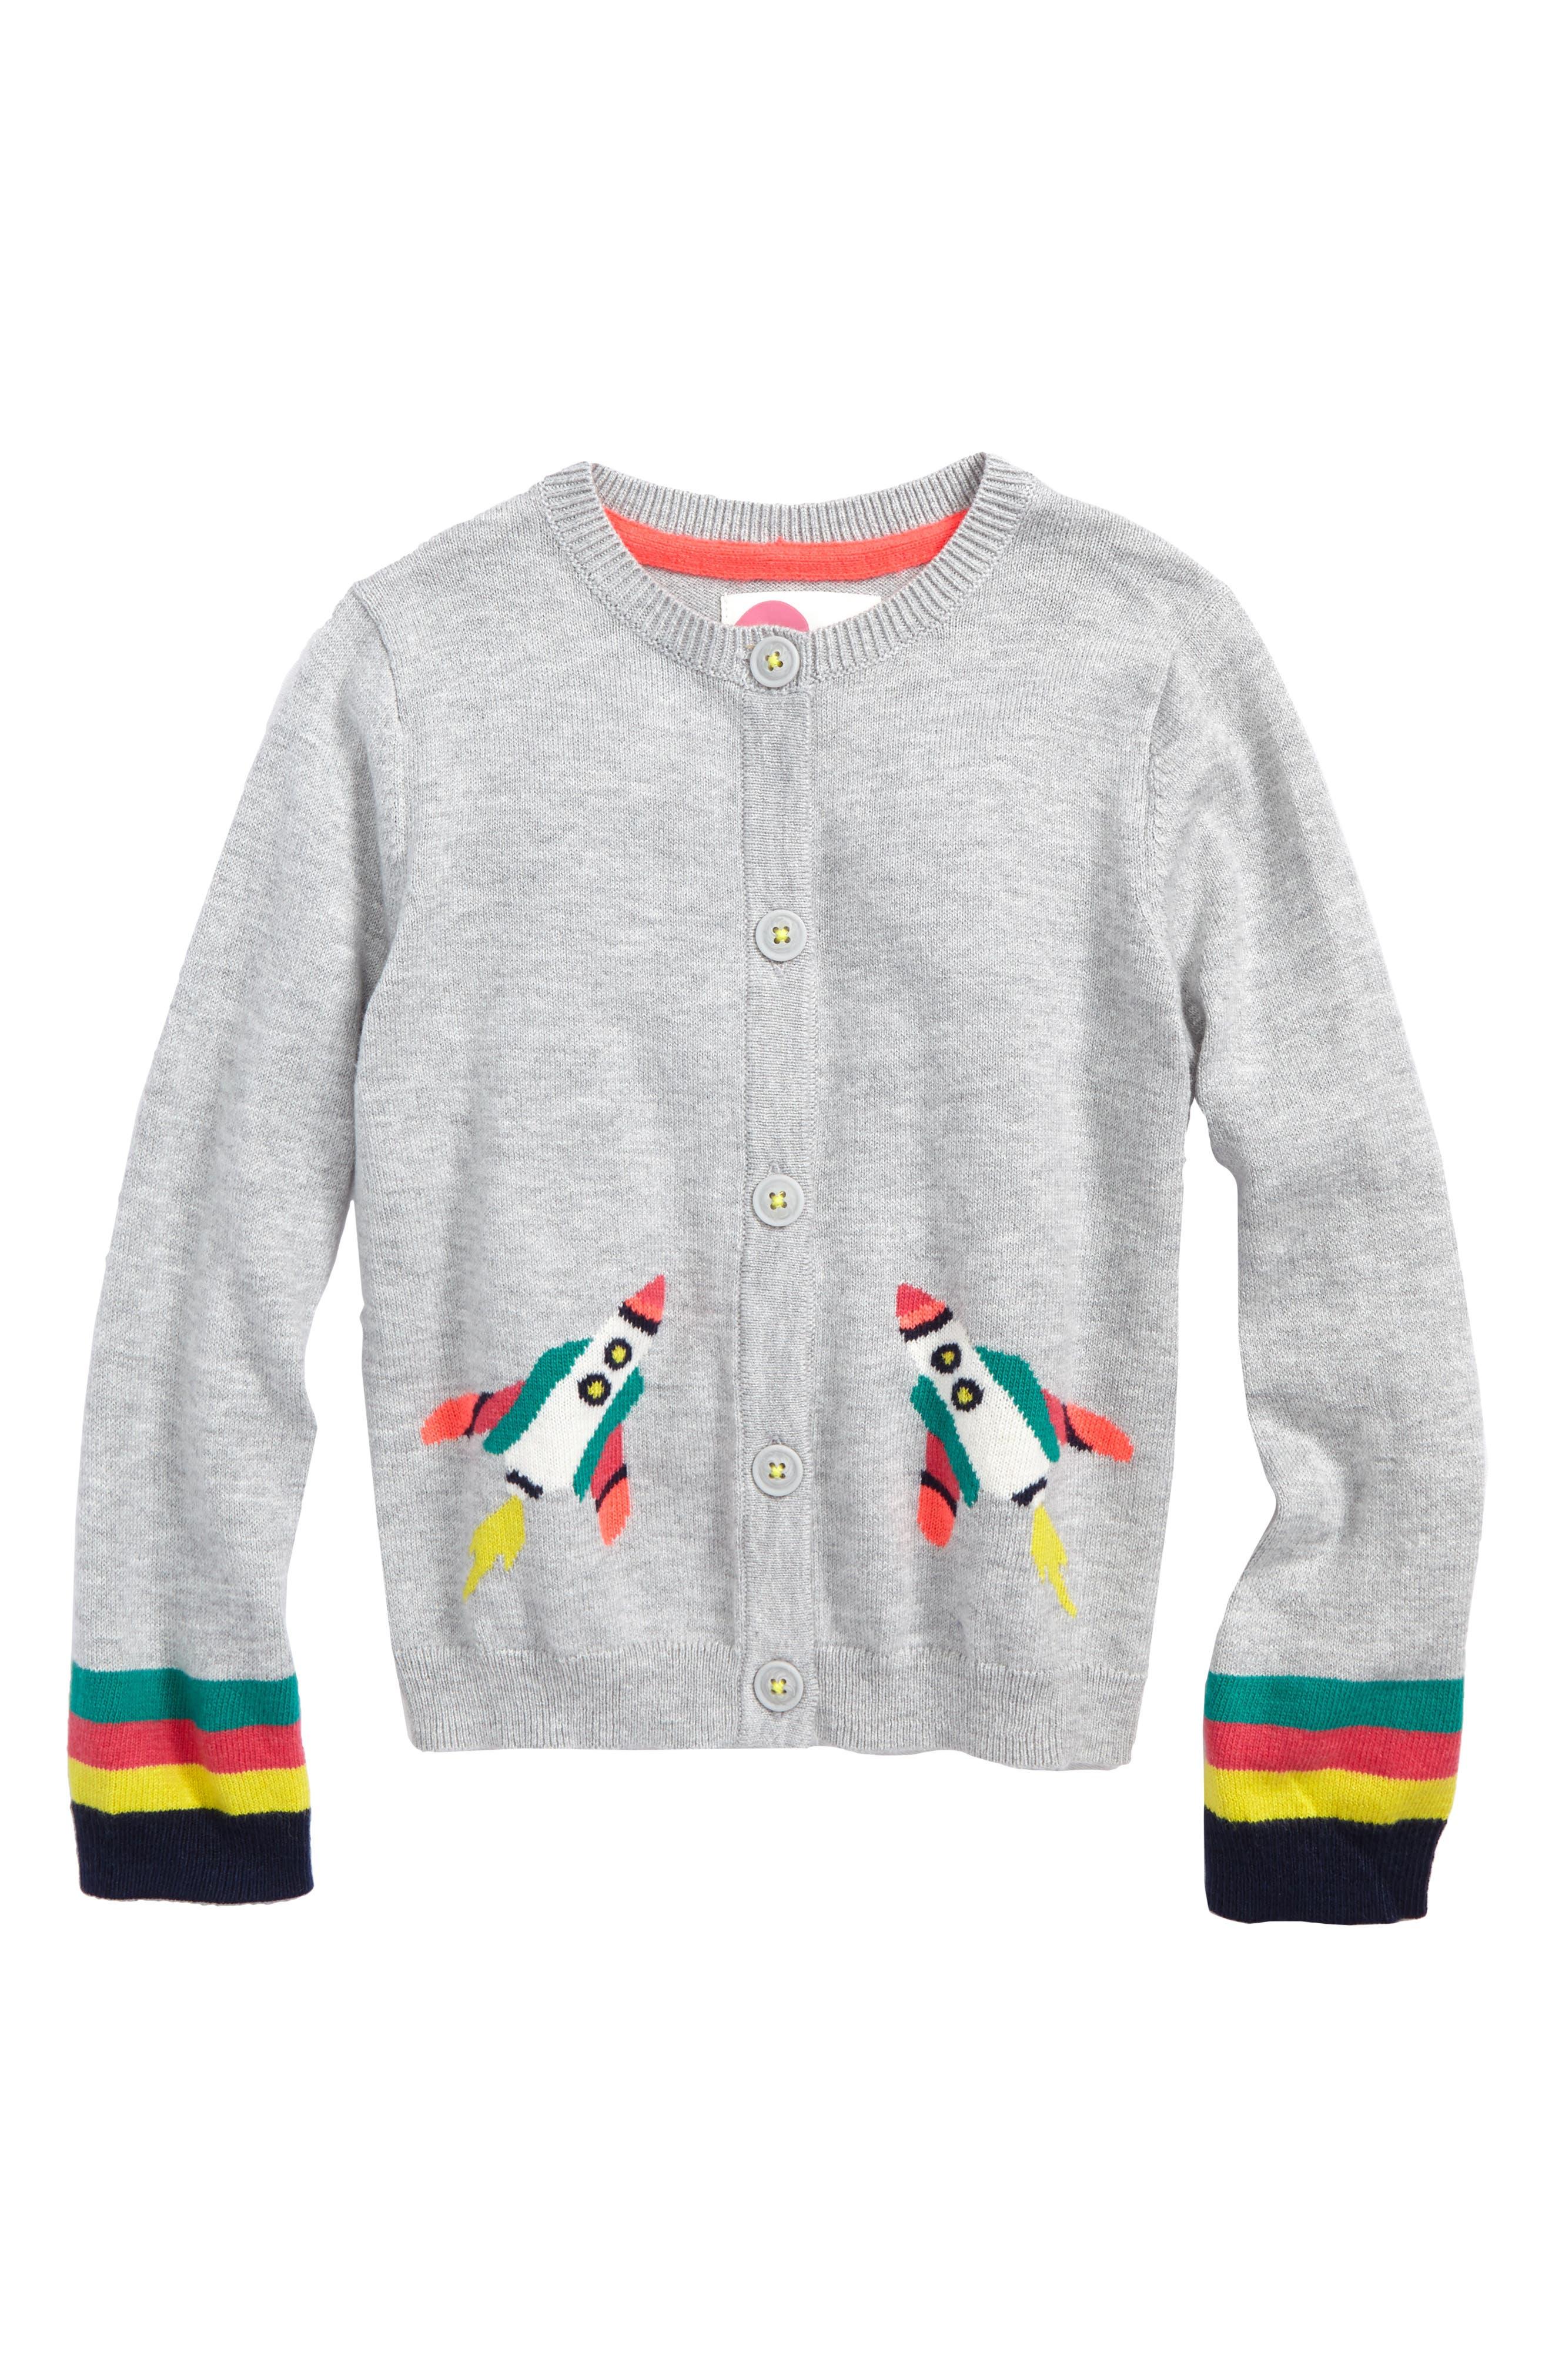 Space Cardigan,                         Main,                         color, Grey Marl